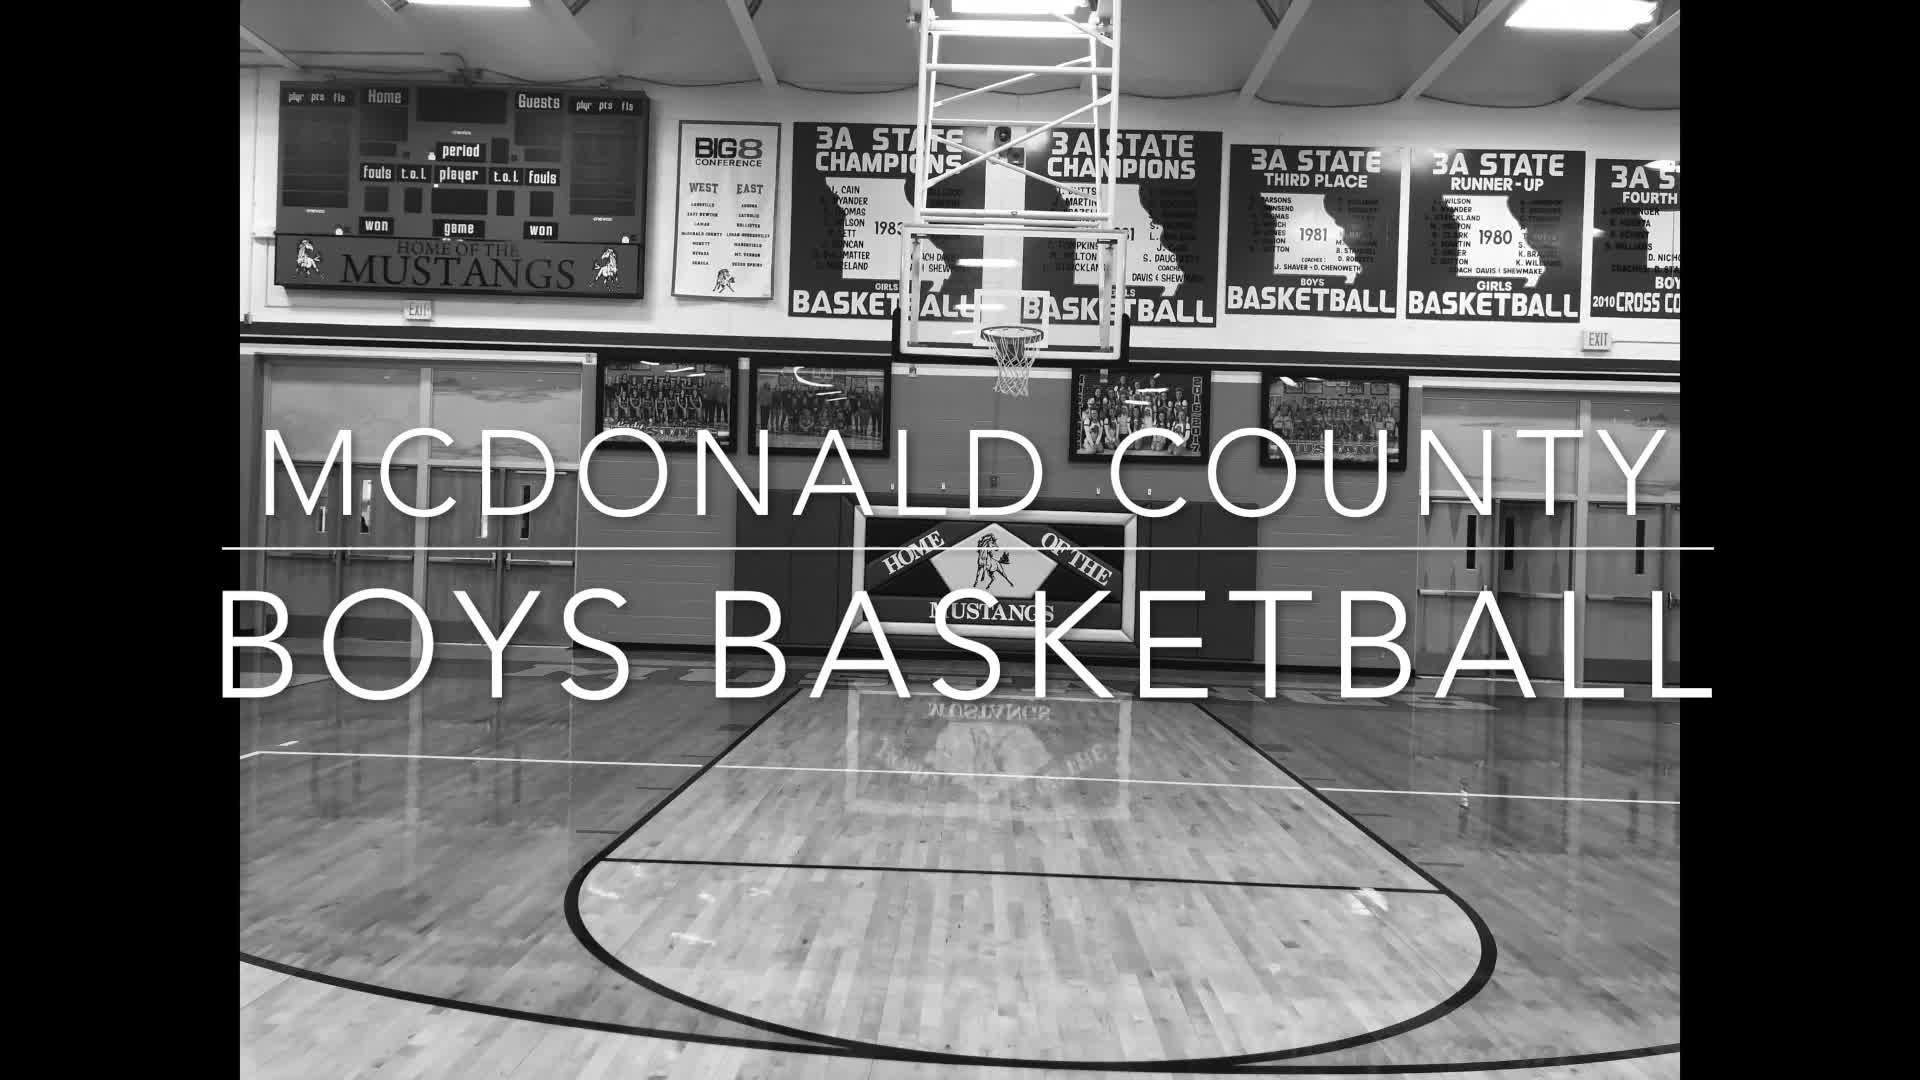 McDonald County High School / Homepage